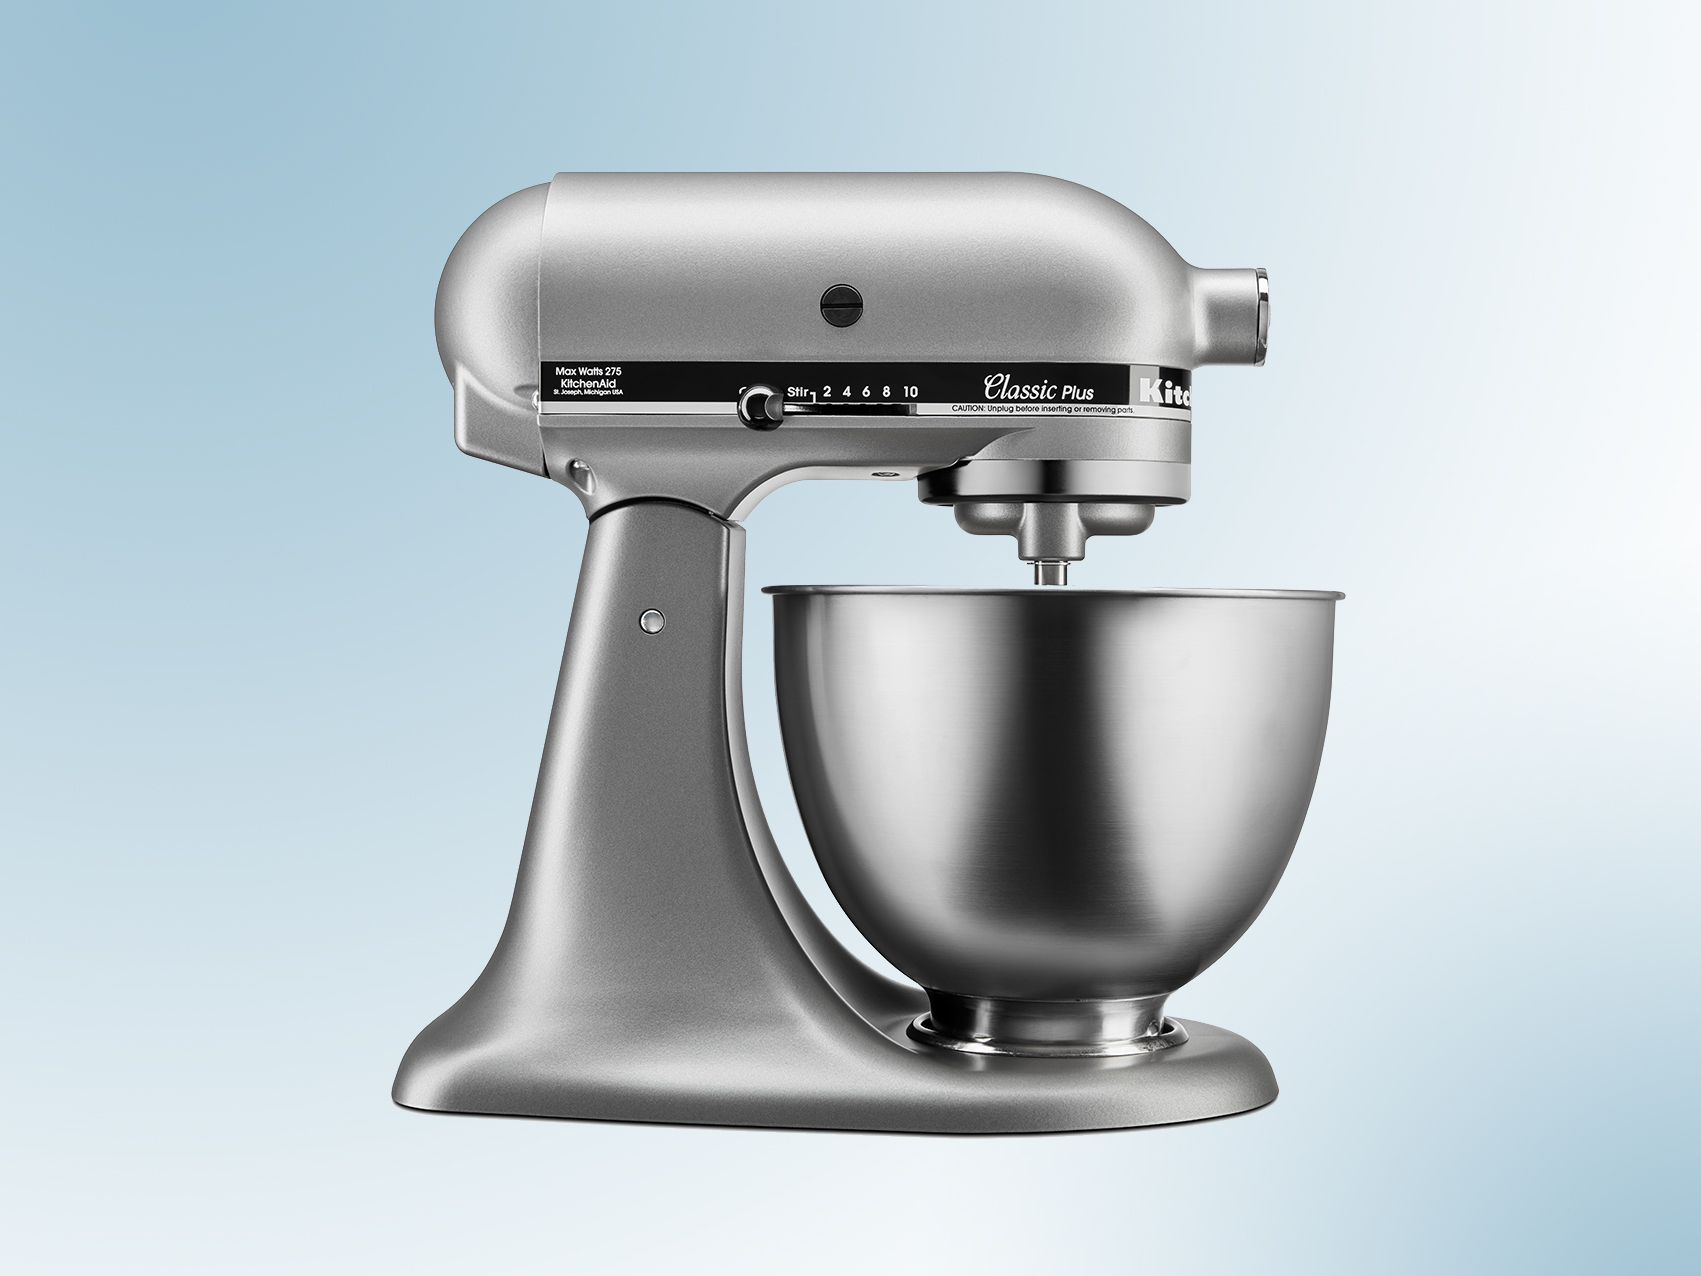 KitchenAid Classic Plus Series 4.5 Quart Tilt-Head Stand Mixer